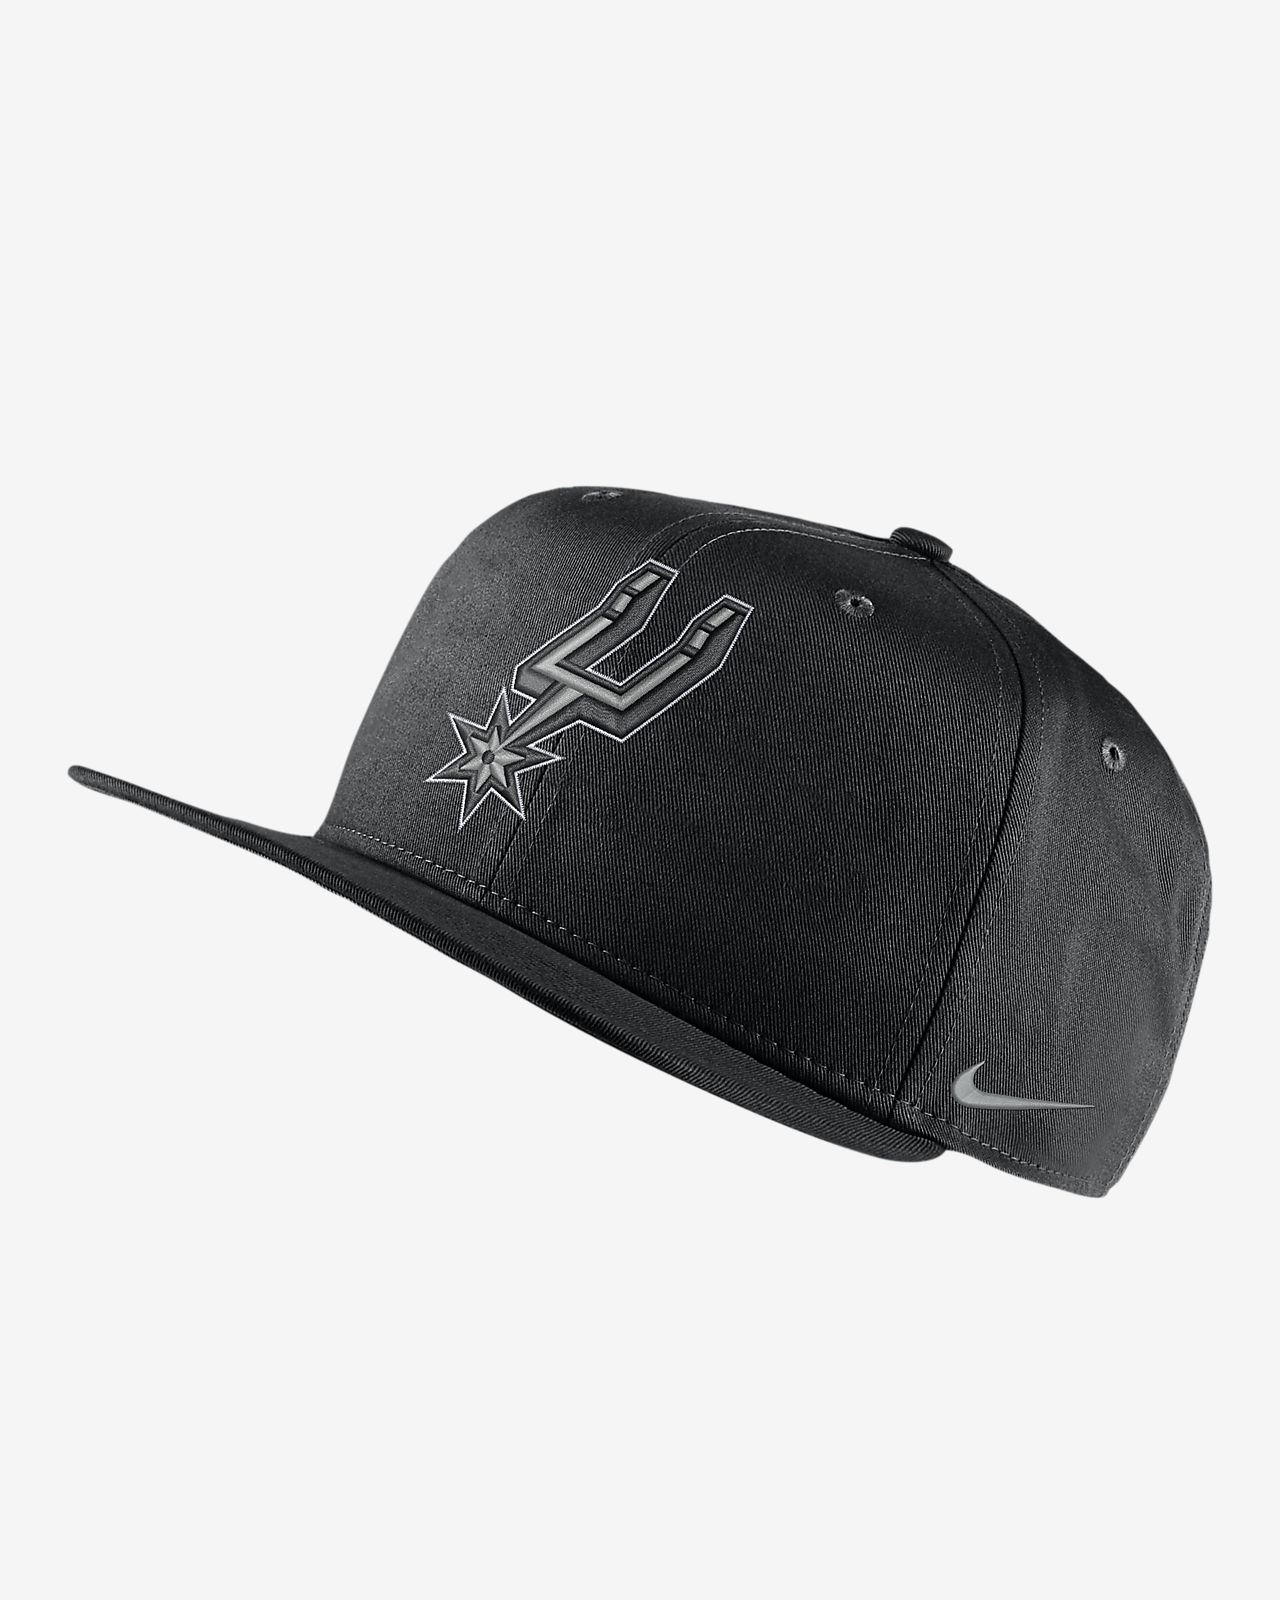 San Antonio Spurs Nike Pro